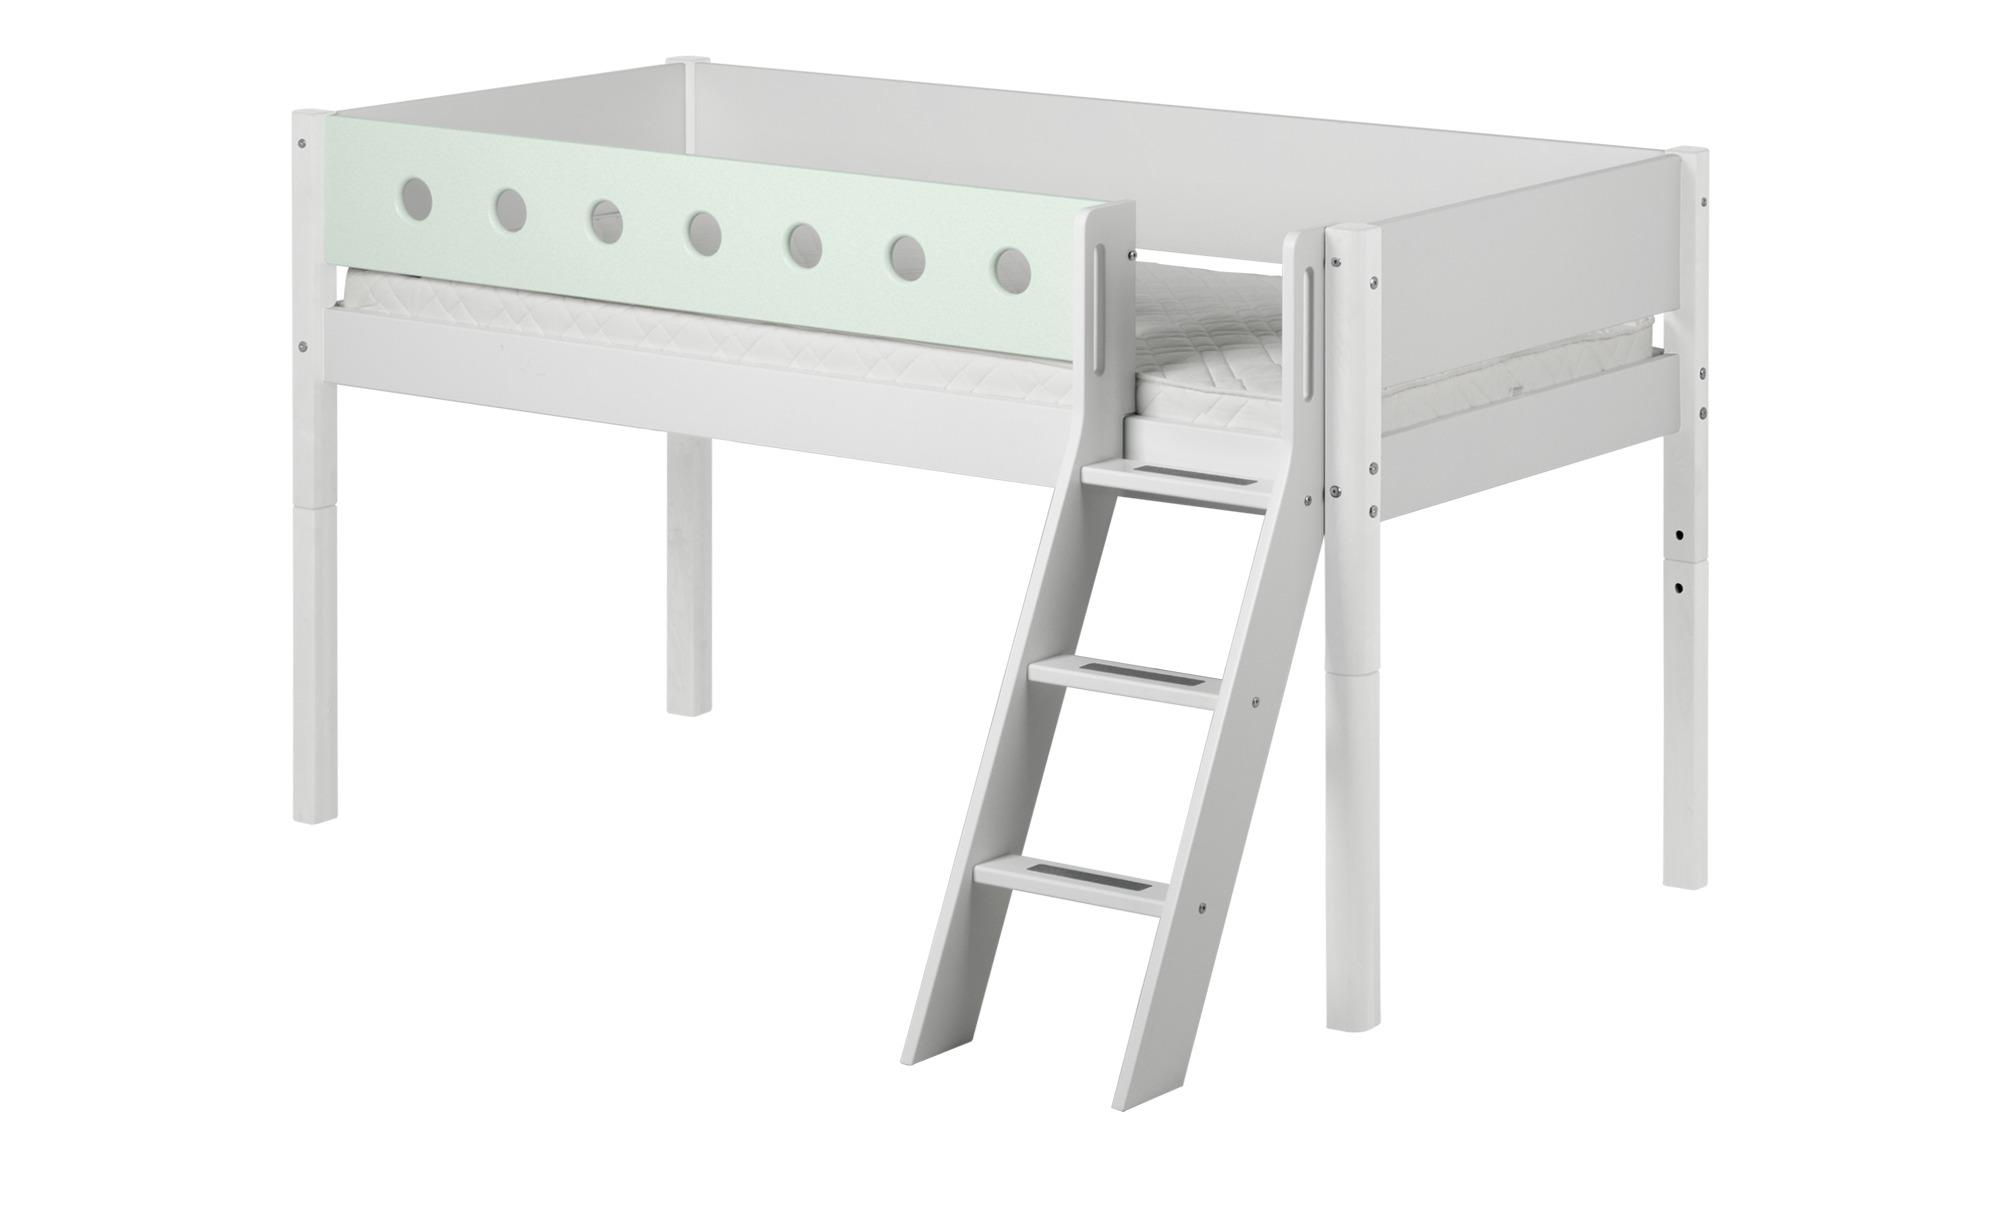 flexa halbhohes bett flexa white breite 151 cm h he 120. Black Bedroom Furniture Sets. Home Design Ideas